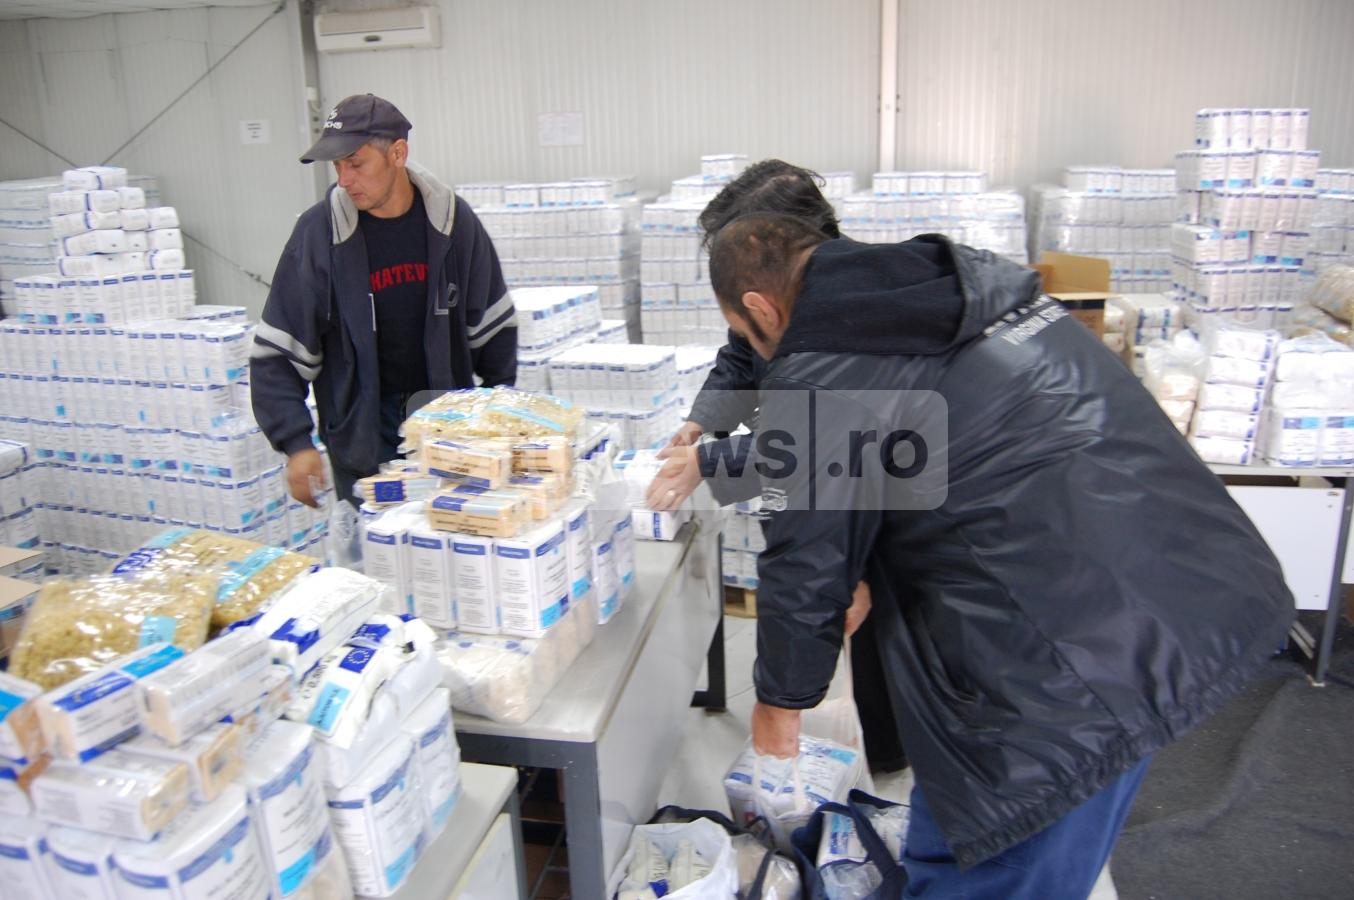 Primaria va imparti din nou alimente gratuite clujenilor